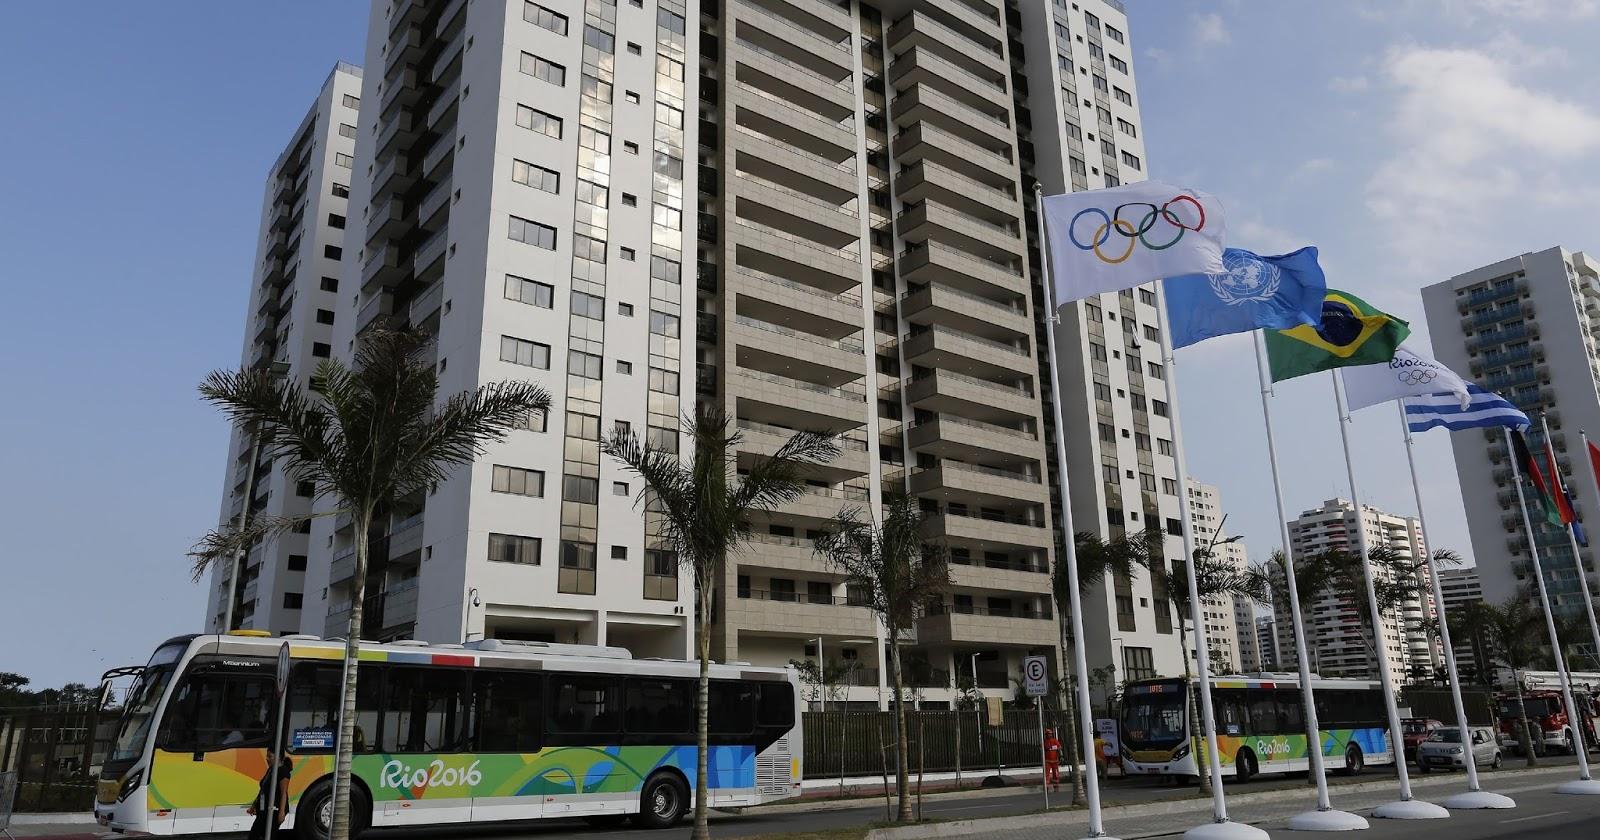 RIO OLYMPIC VILLAGE 2